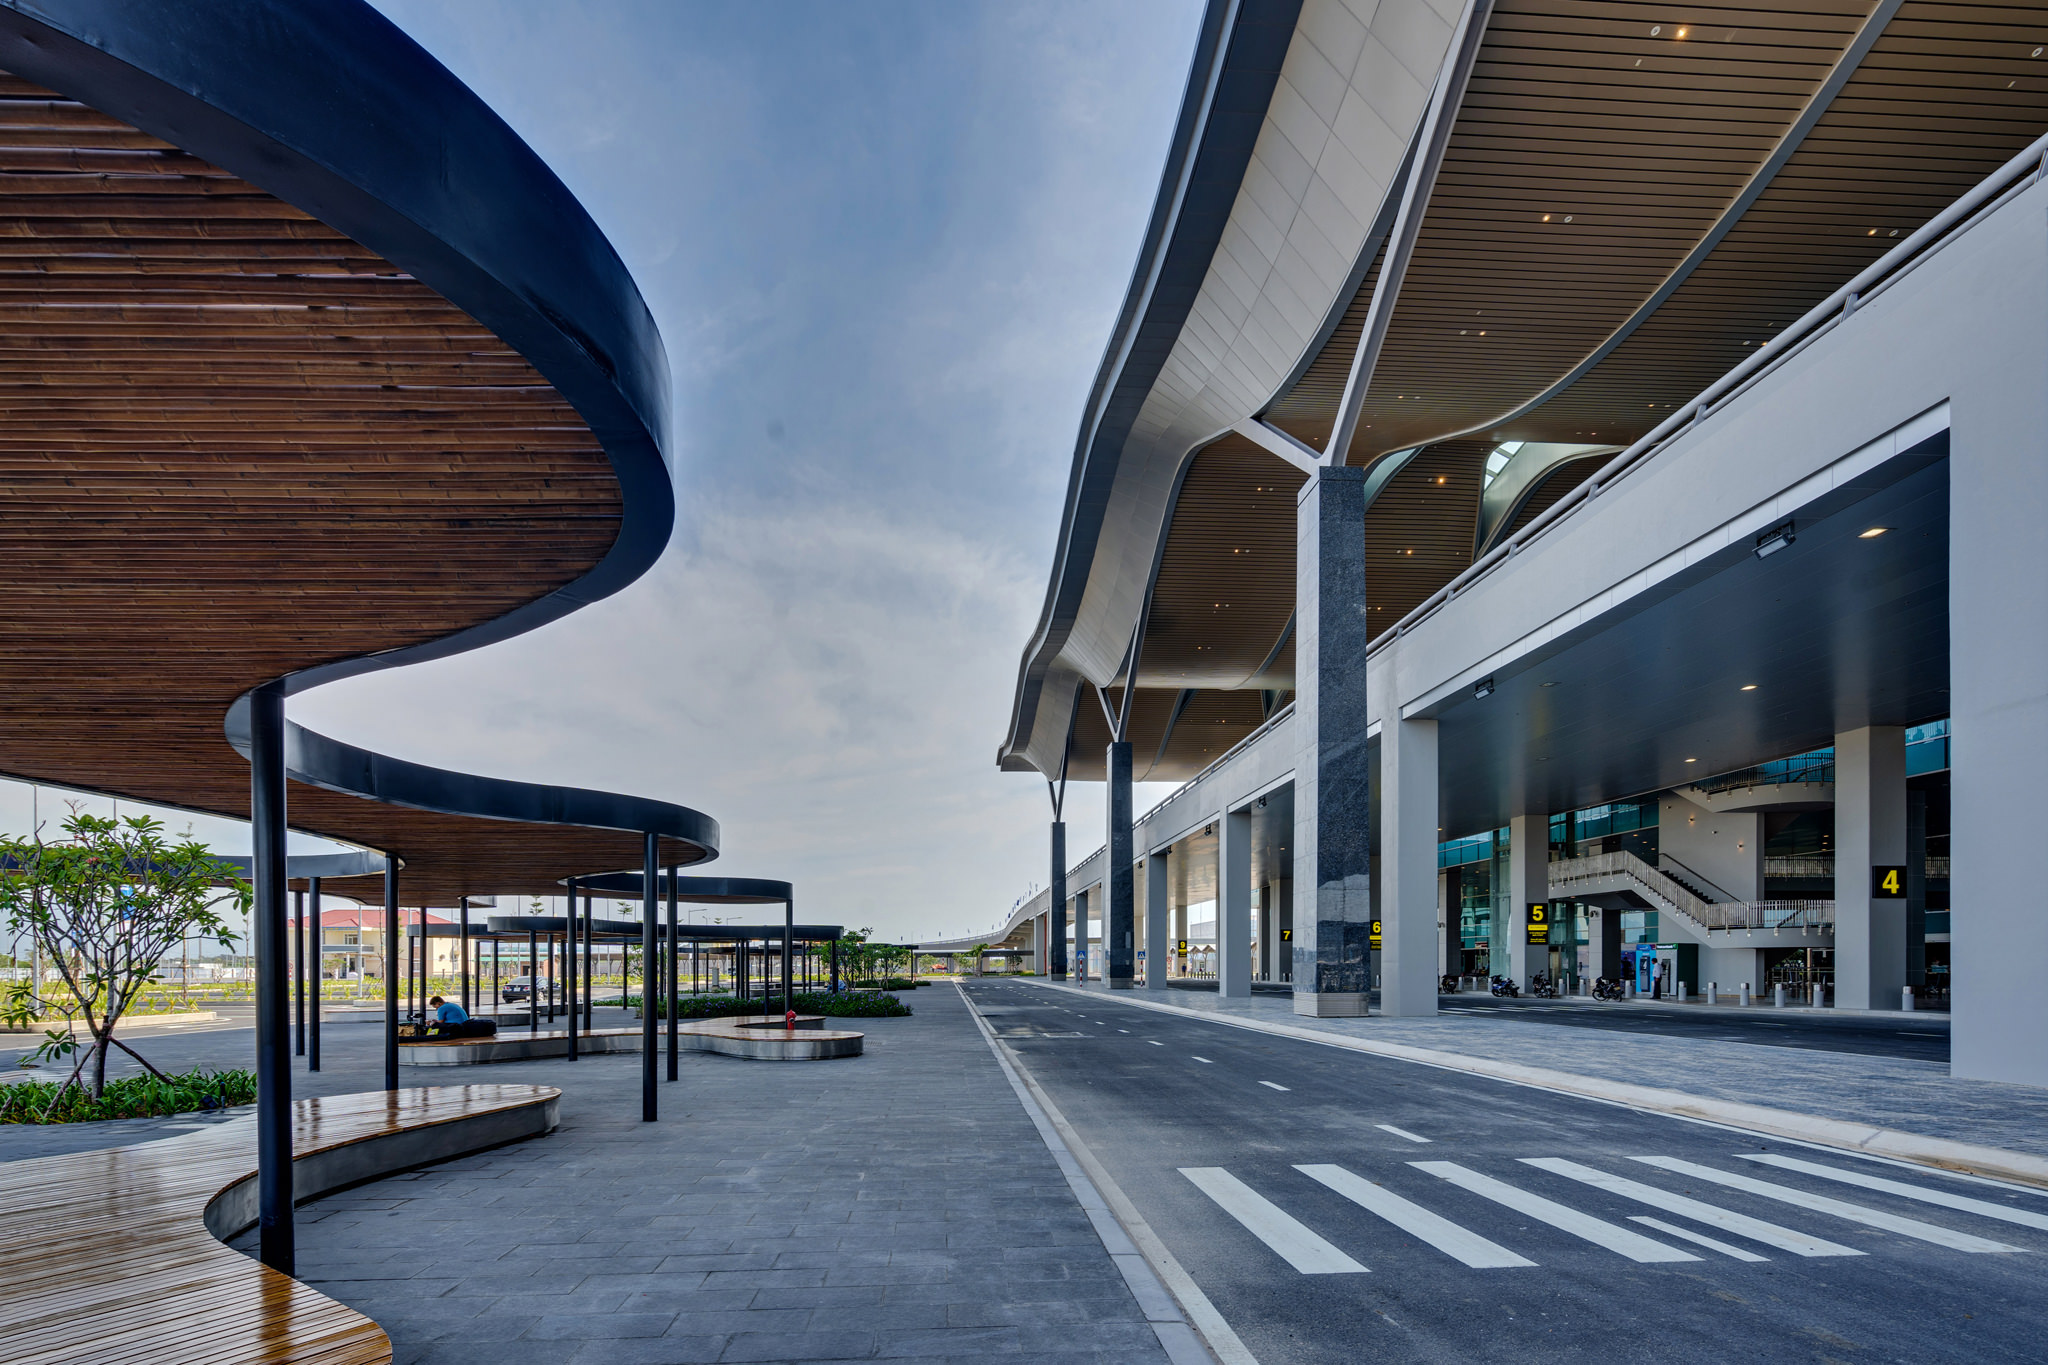 20180626 - Cam Ranh Airport - Architecture - 0264.jpg